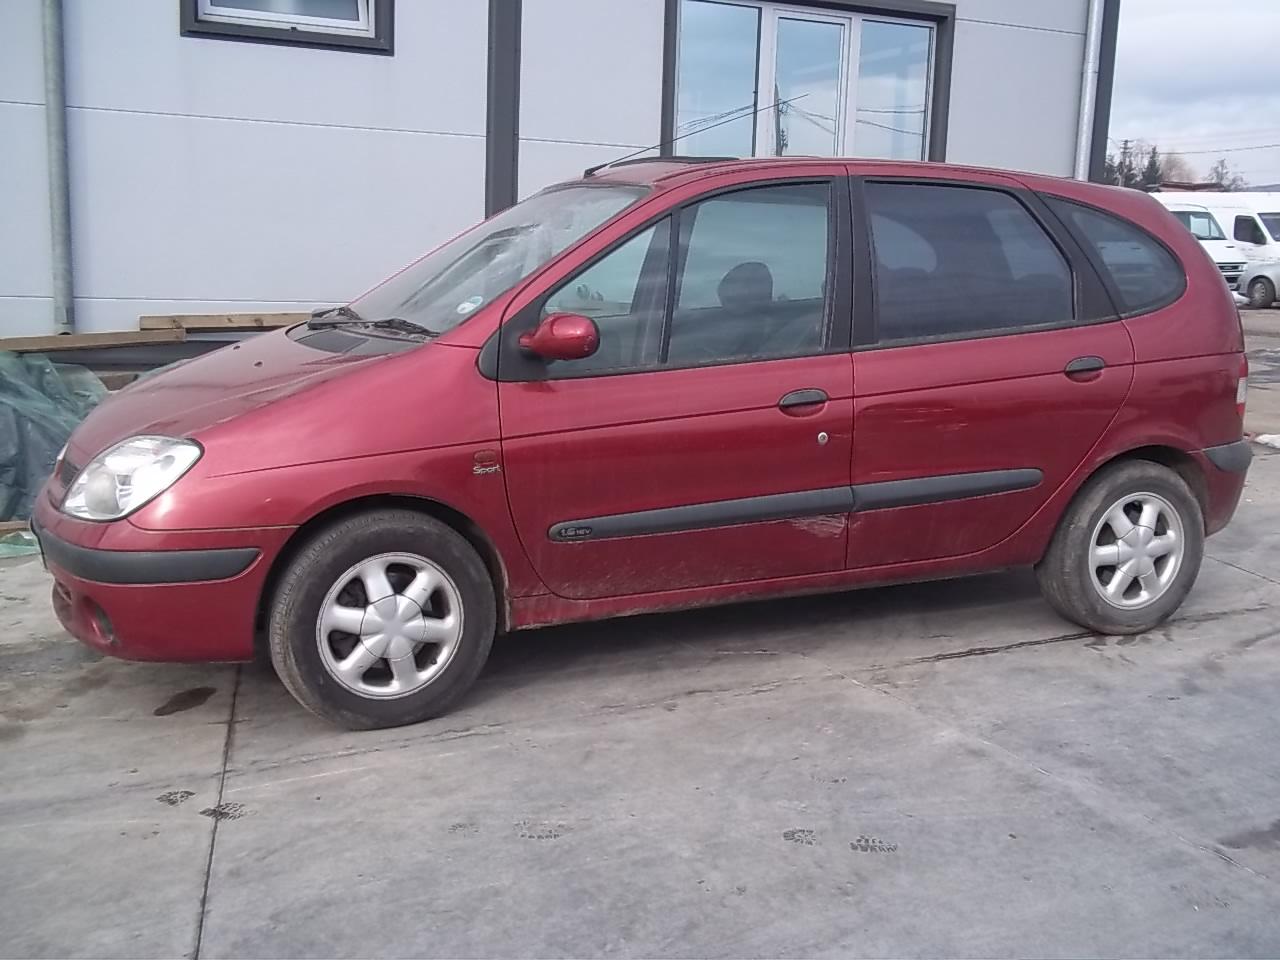 Dezmembrez Renault Scenic 2001 Benzina Hatchback - 04 Ianuarie 2013 - Poza 2